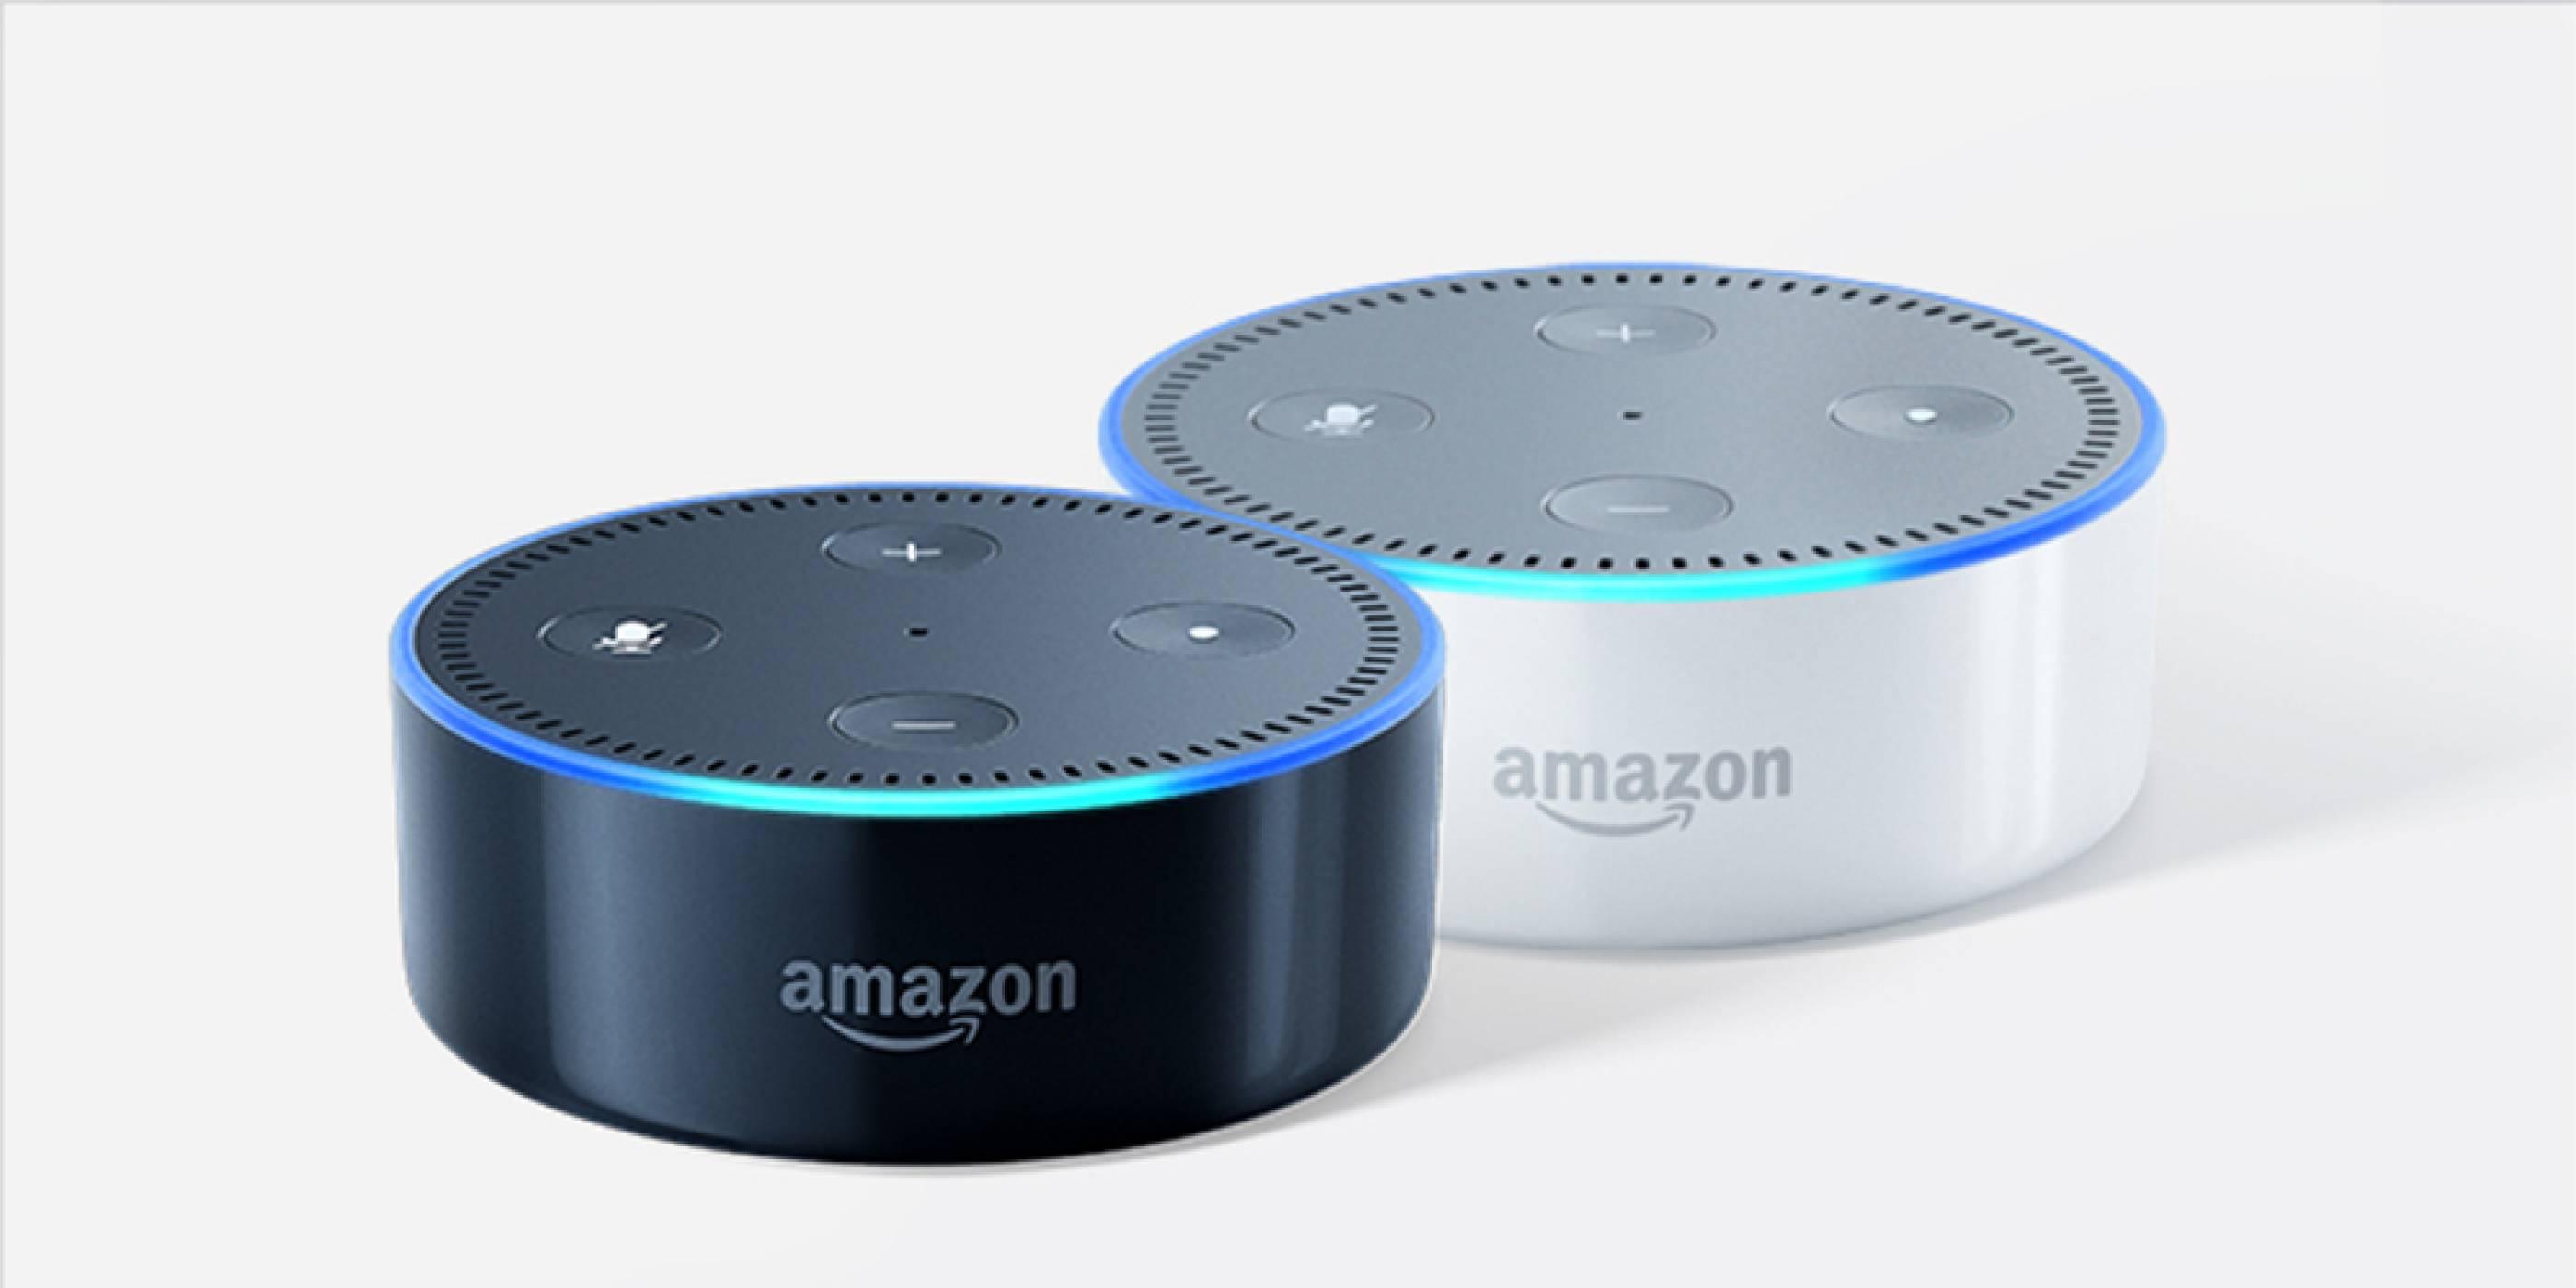 Гласовият асистент Alexa на Amazon вече може да шепти и да говори по-правдоподобно